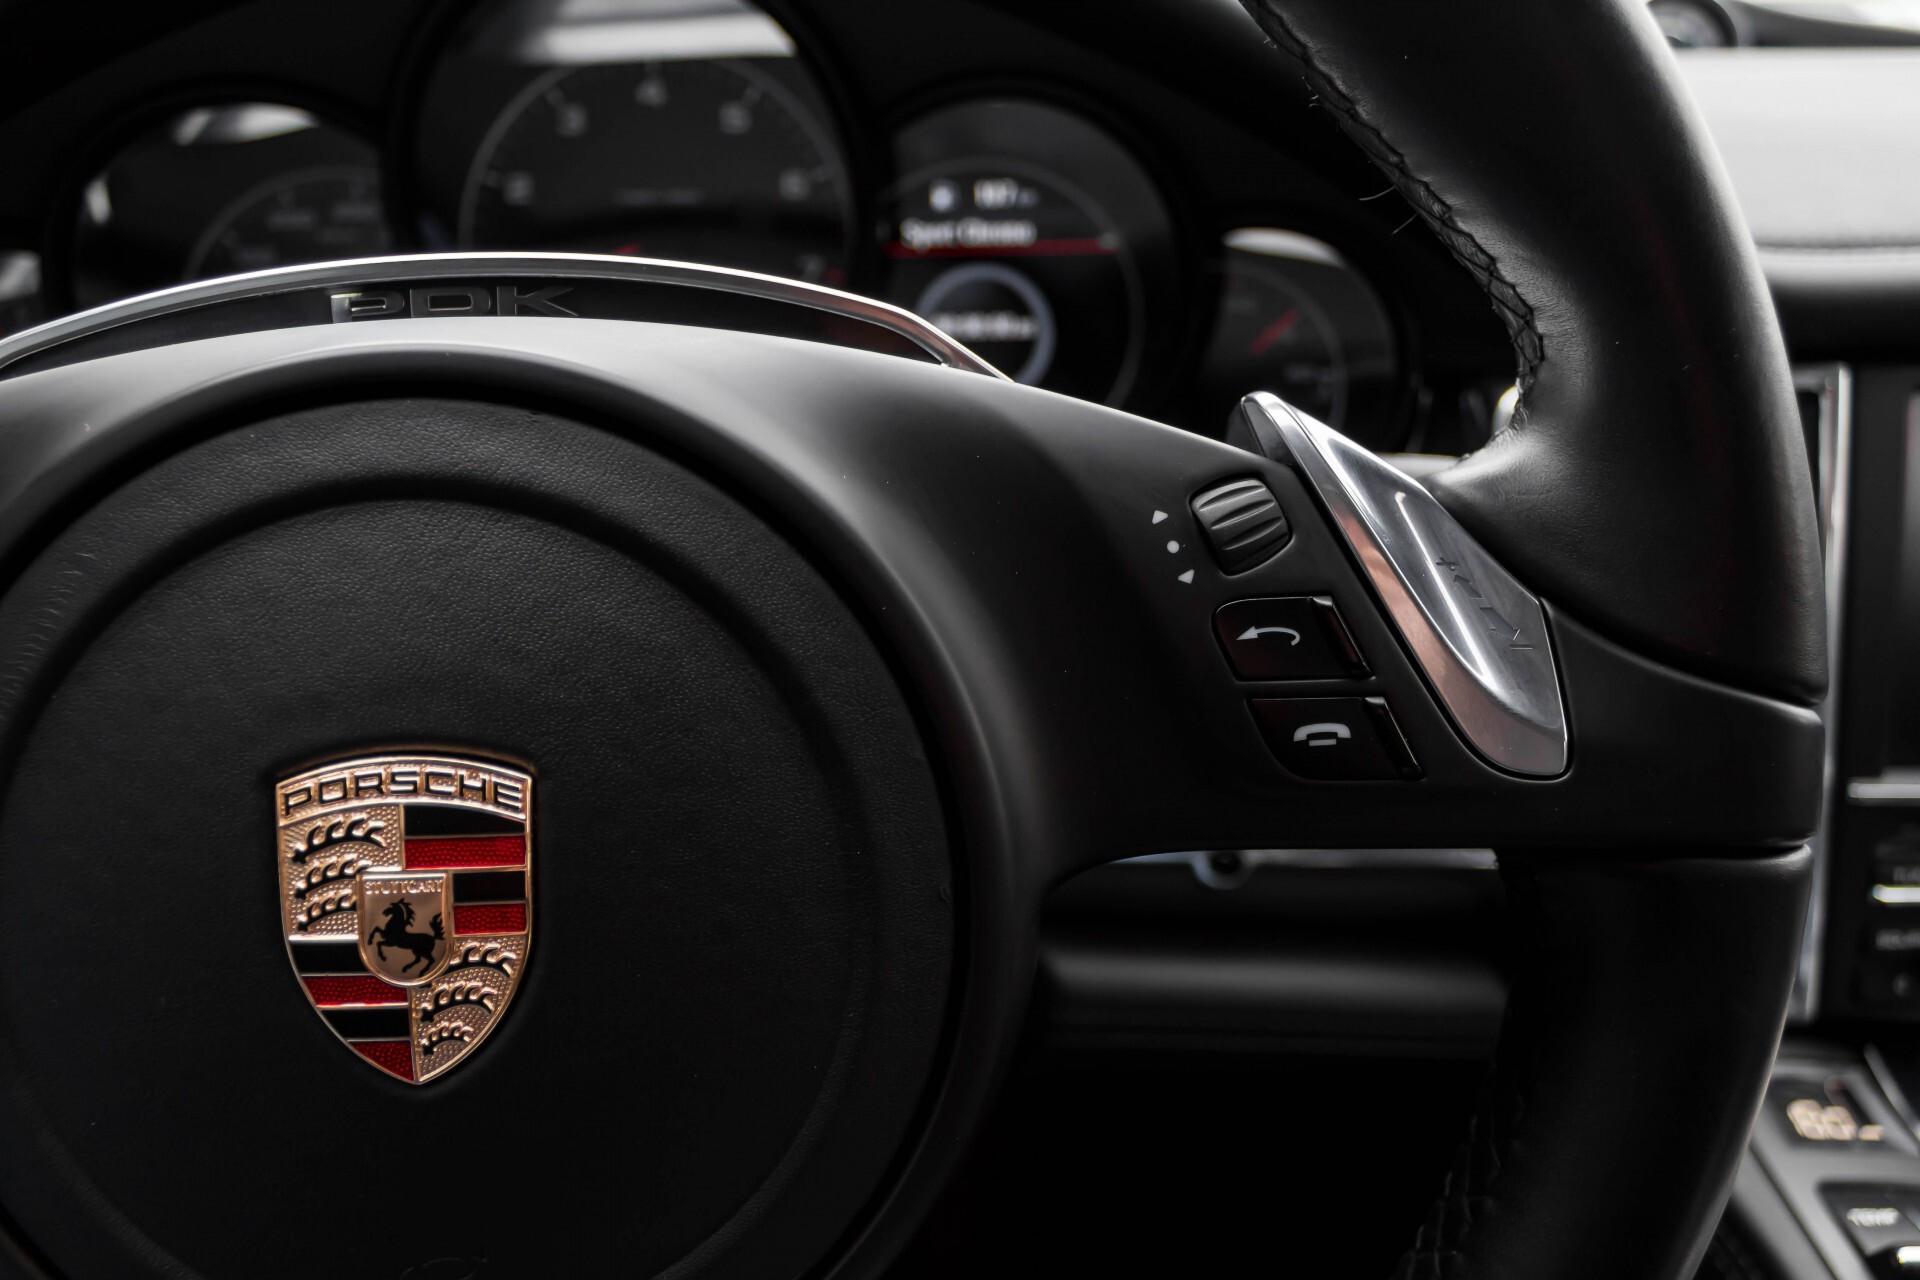 Porsche Panamera 3.6 4 Sportchrono/Luchtvering/Dak/Nappa/Aut7 Foto 15